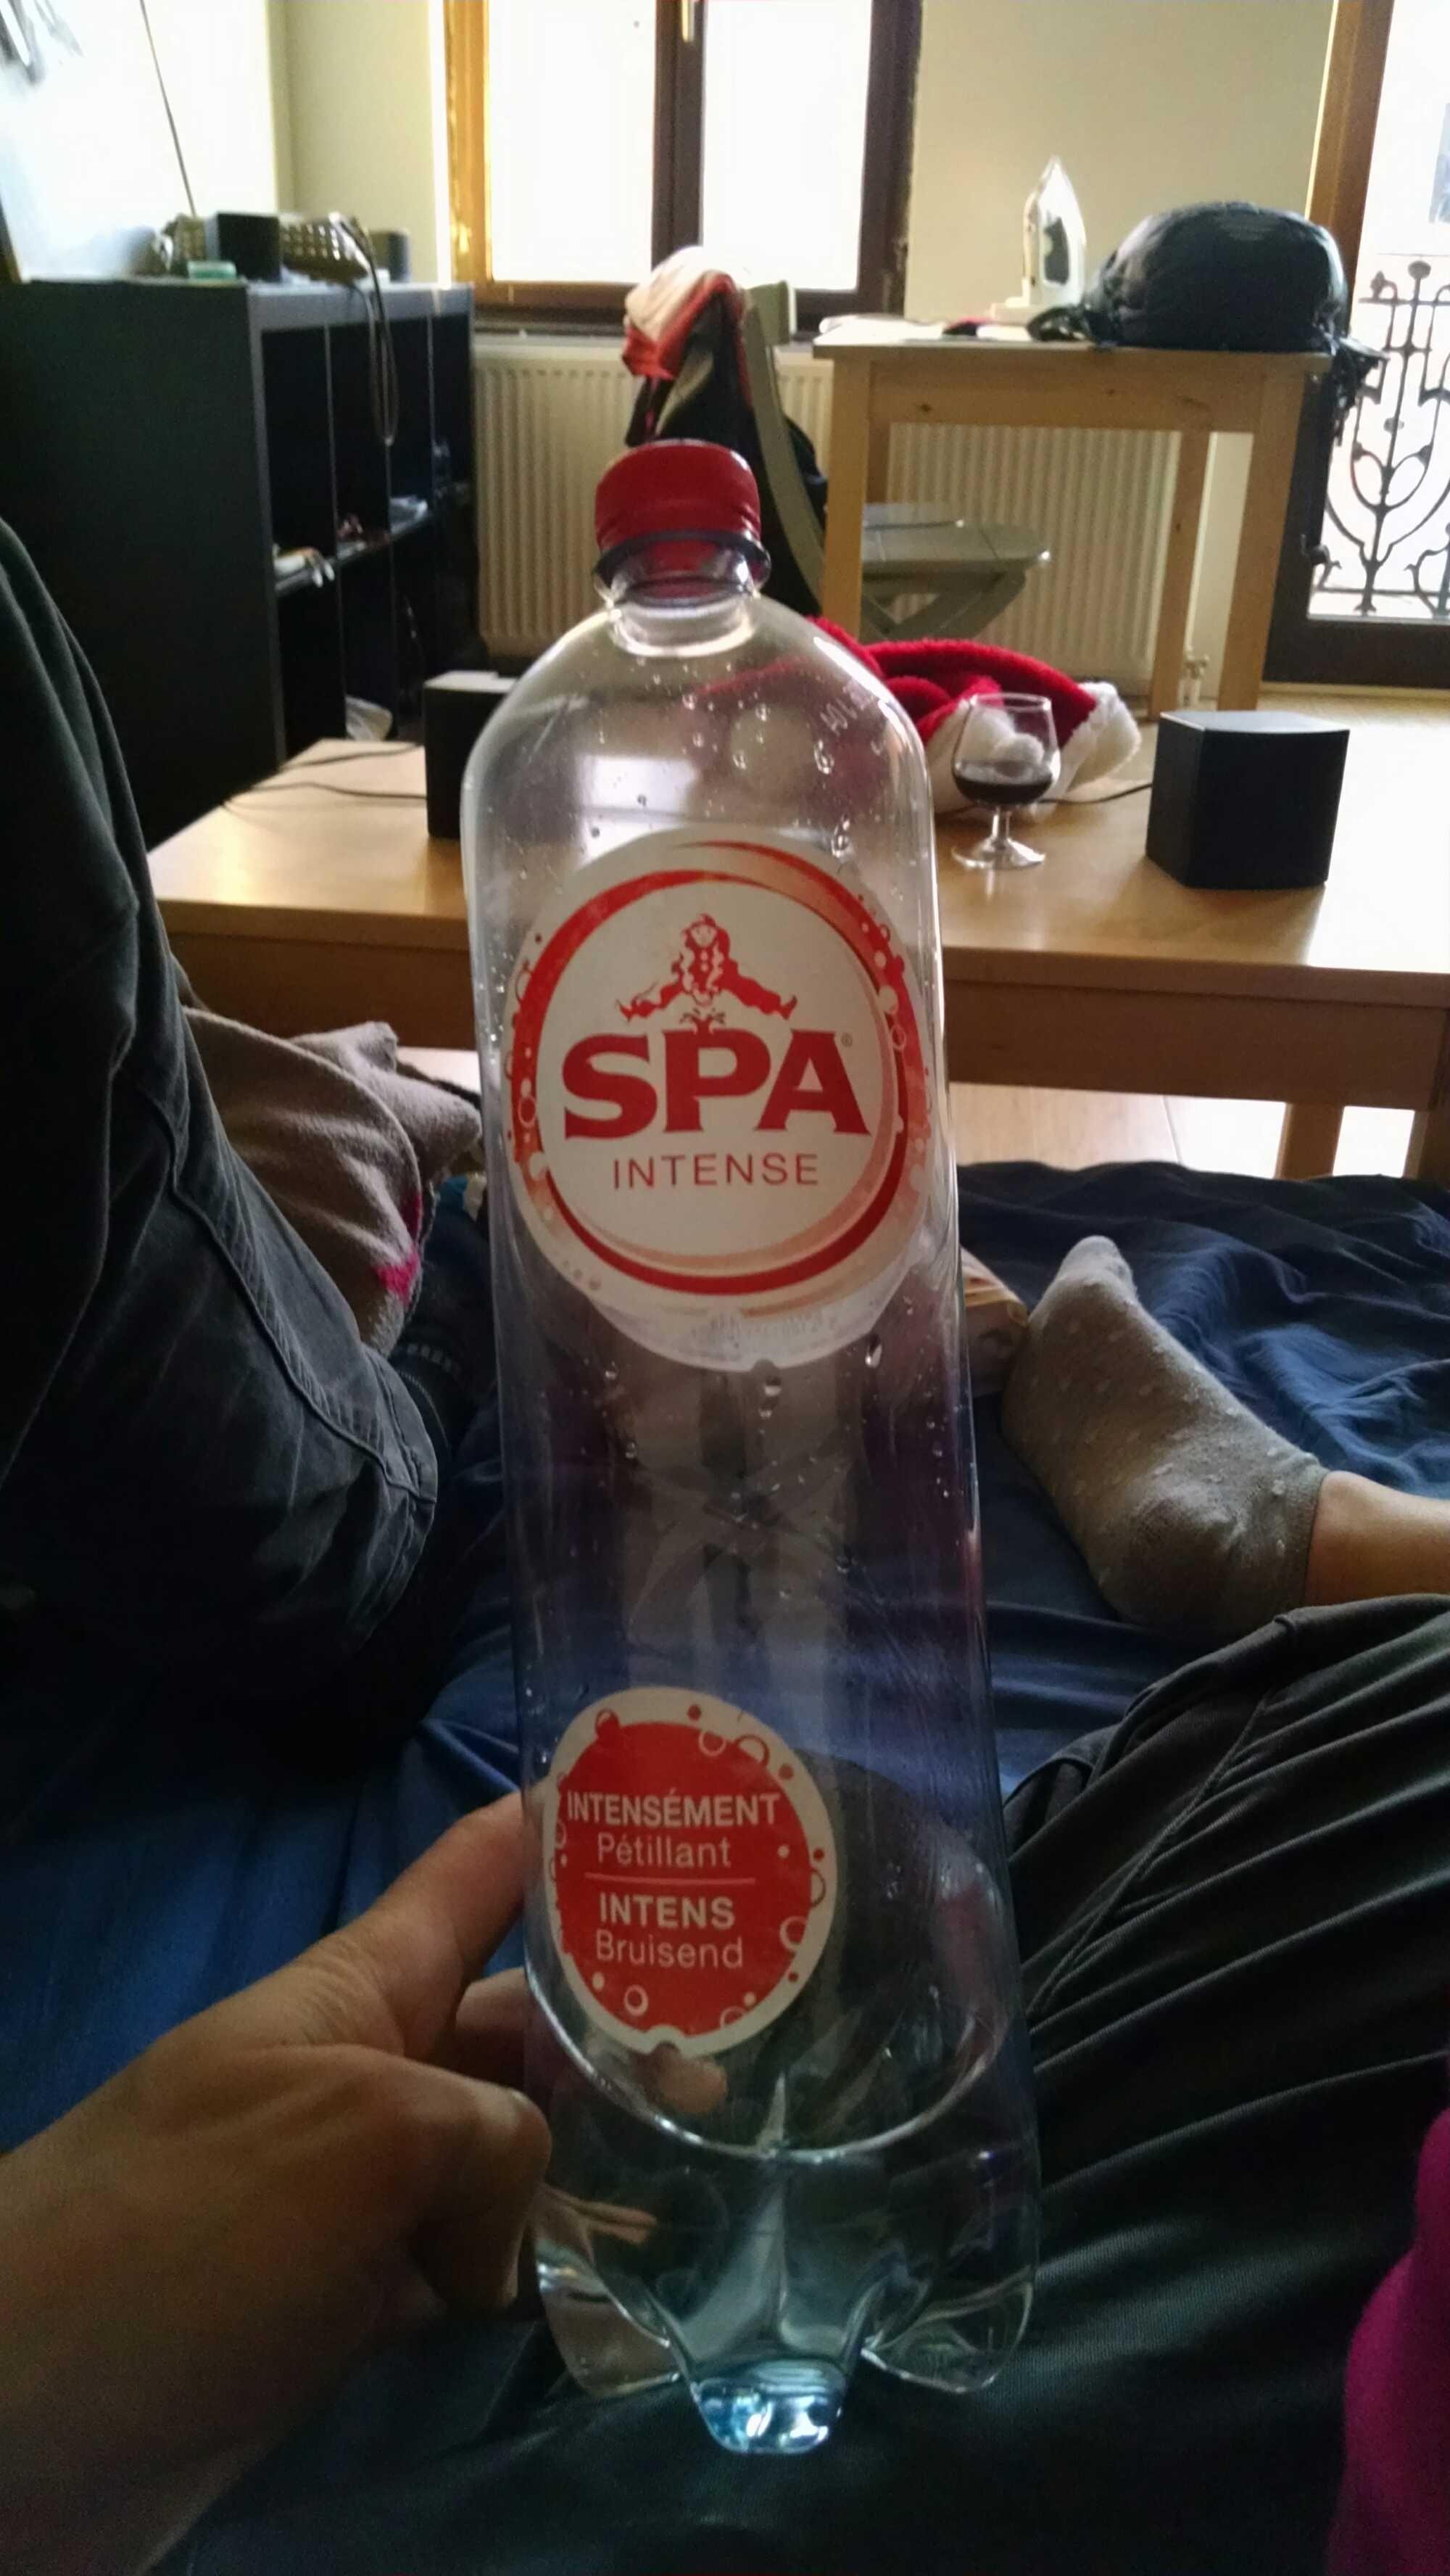 Spa Intense - Intensément pétillant - Product - fr